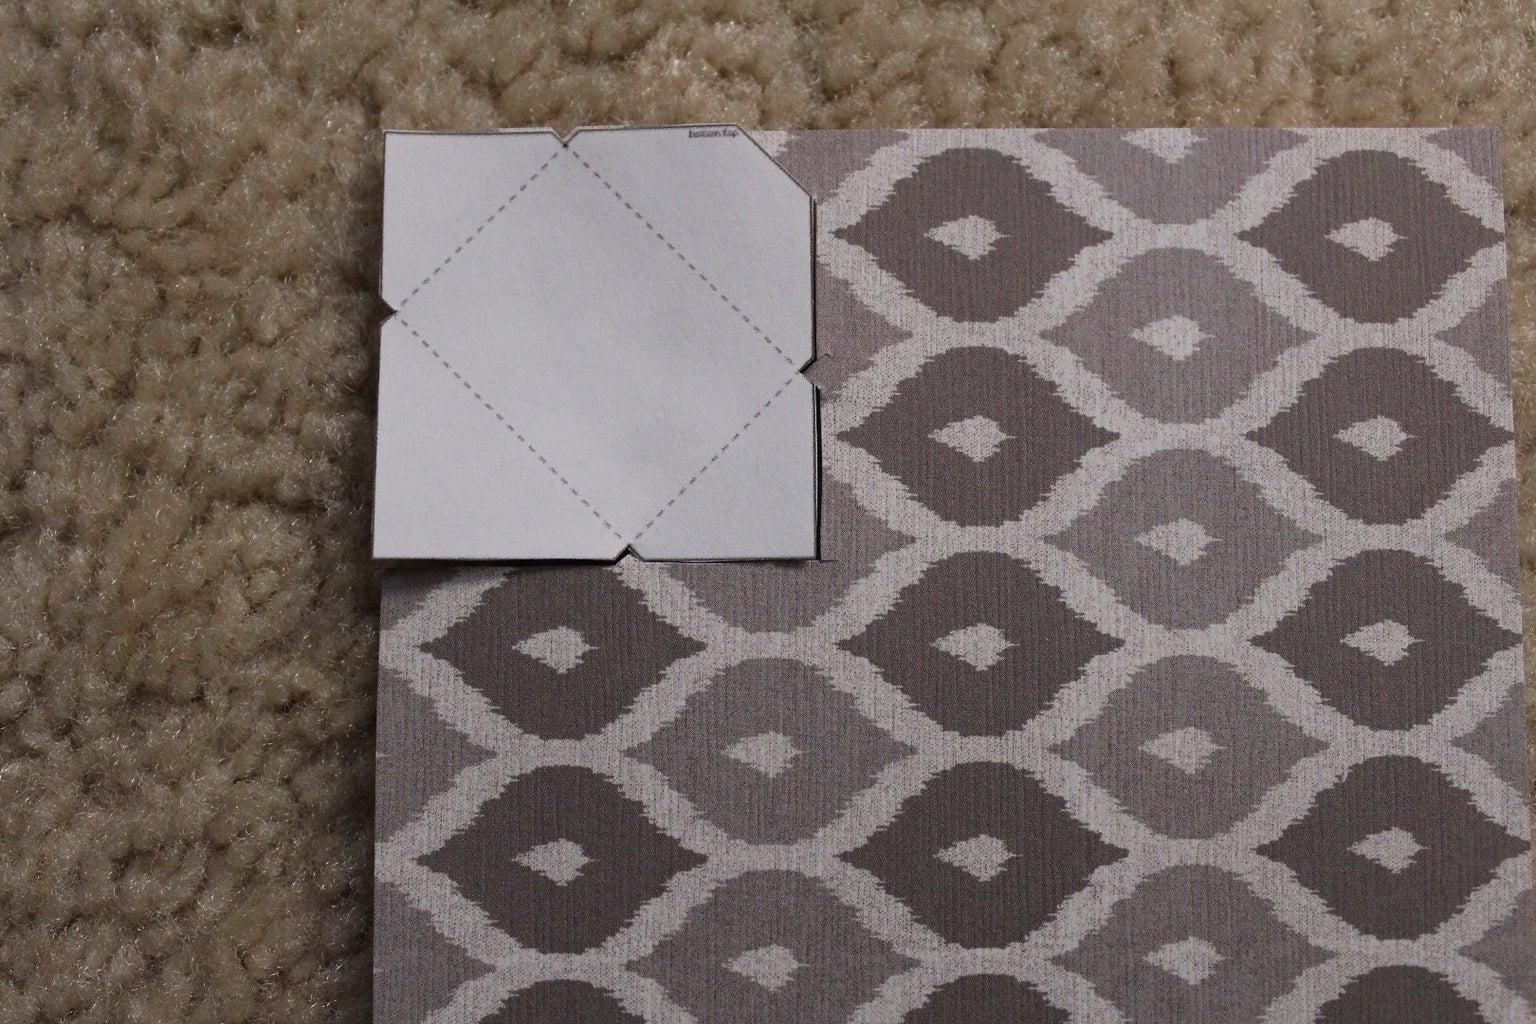 Making the Envelopes